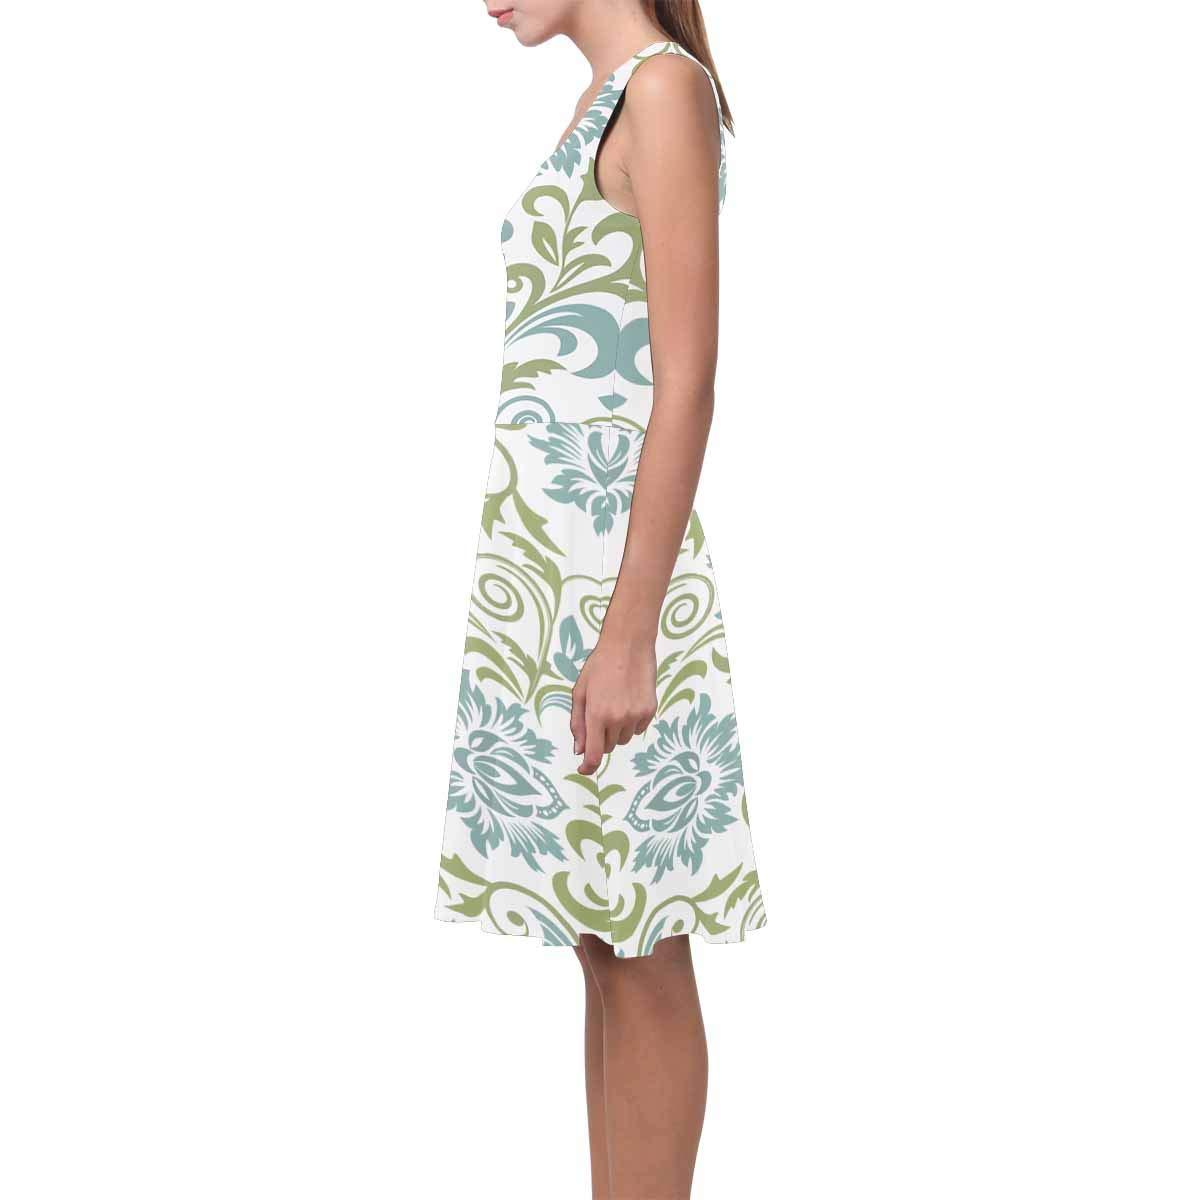 XS-3XL InterestPrint Womens Casual Tank Dresses Damask Floral Pattern Scoop Neck Sleeveless Sundresses